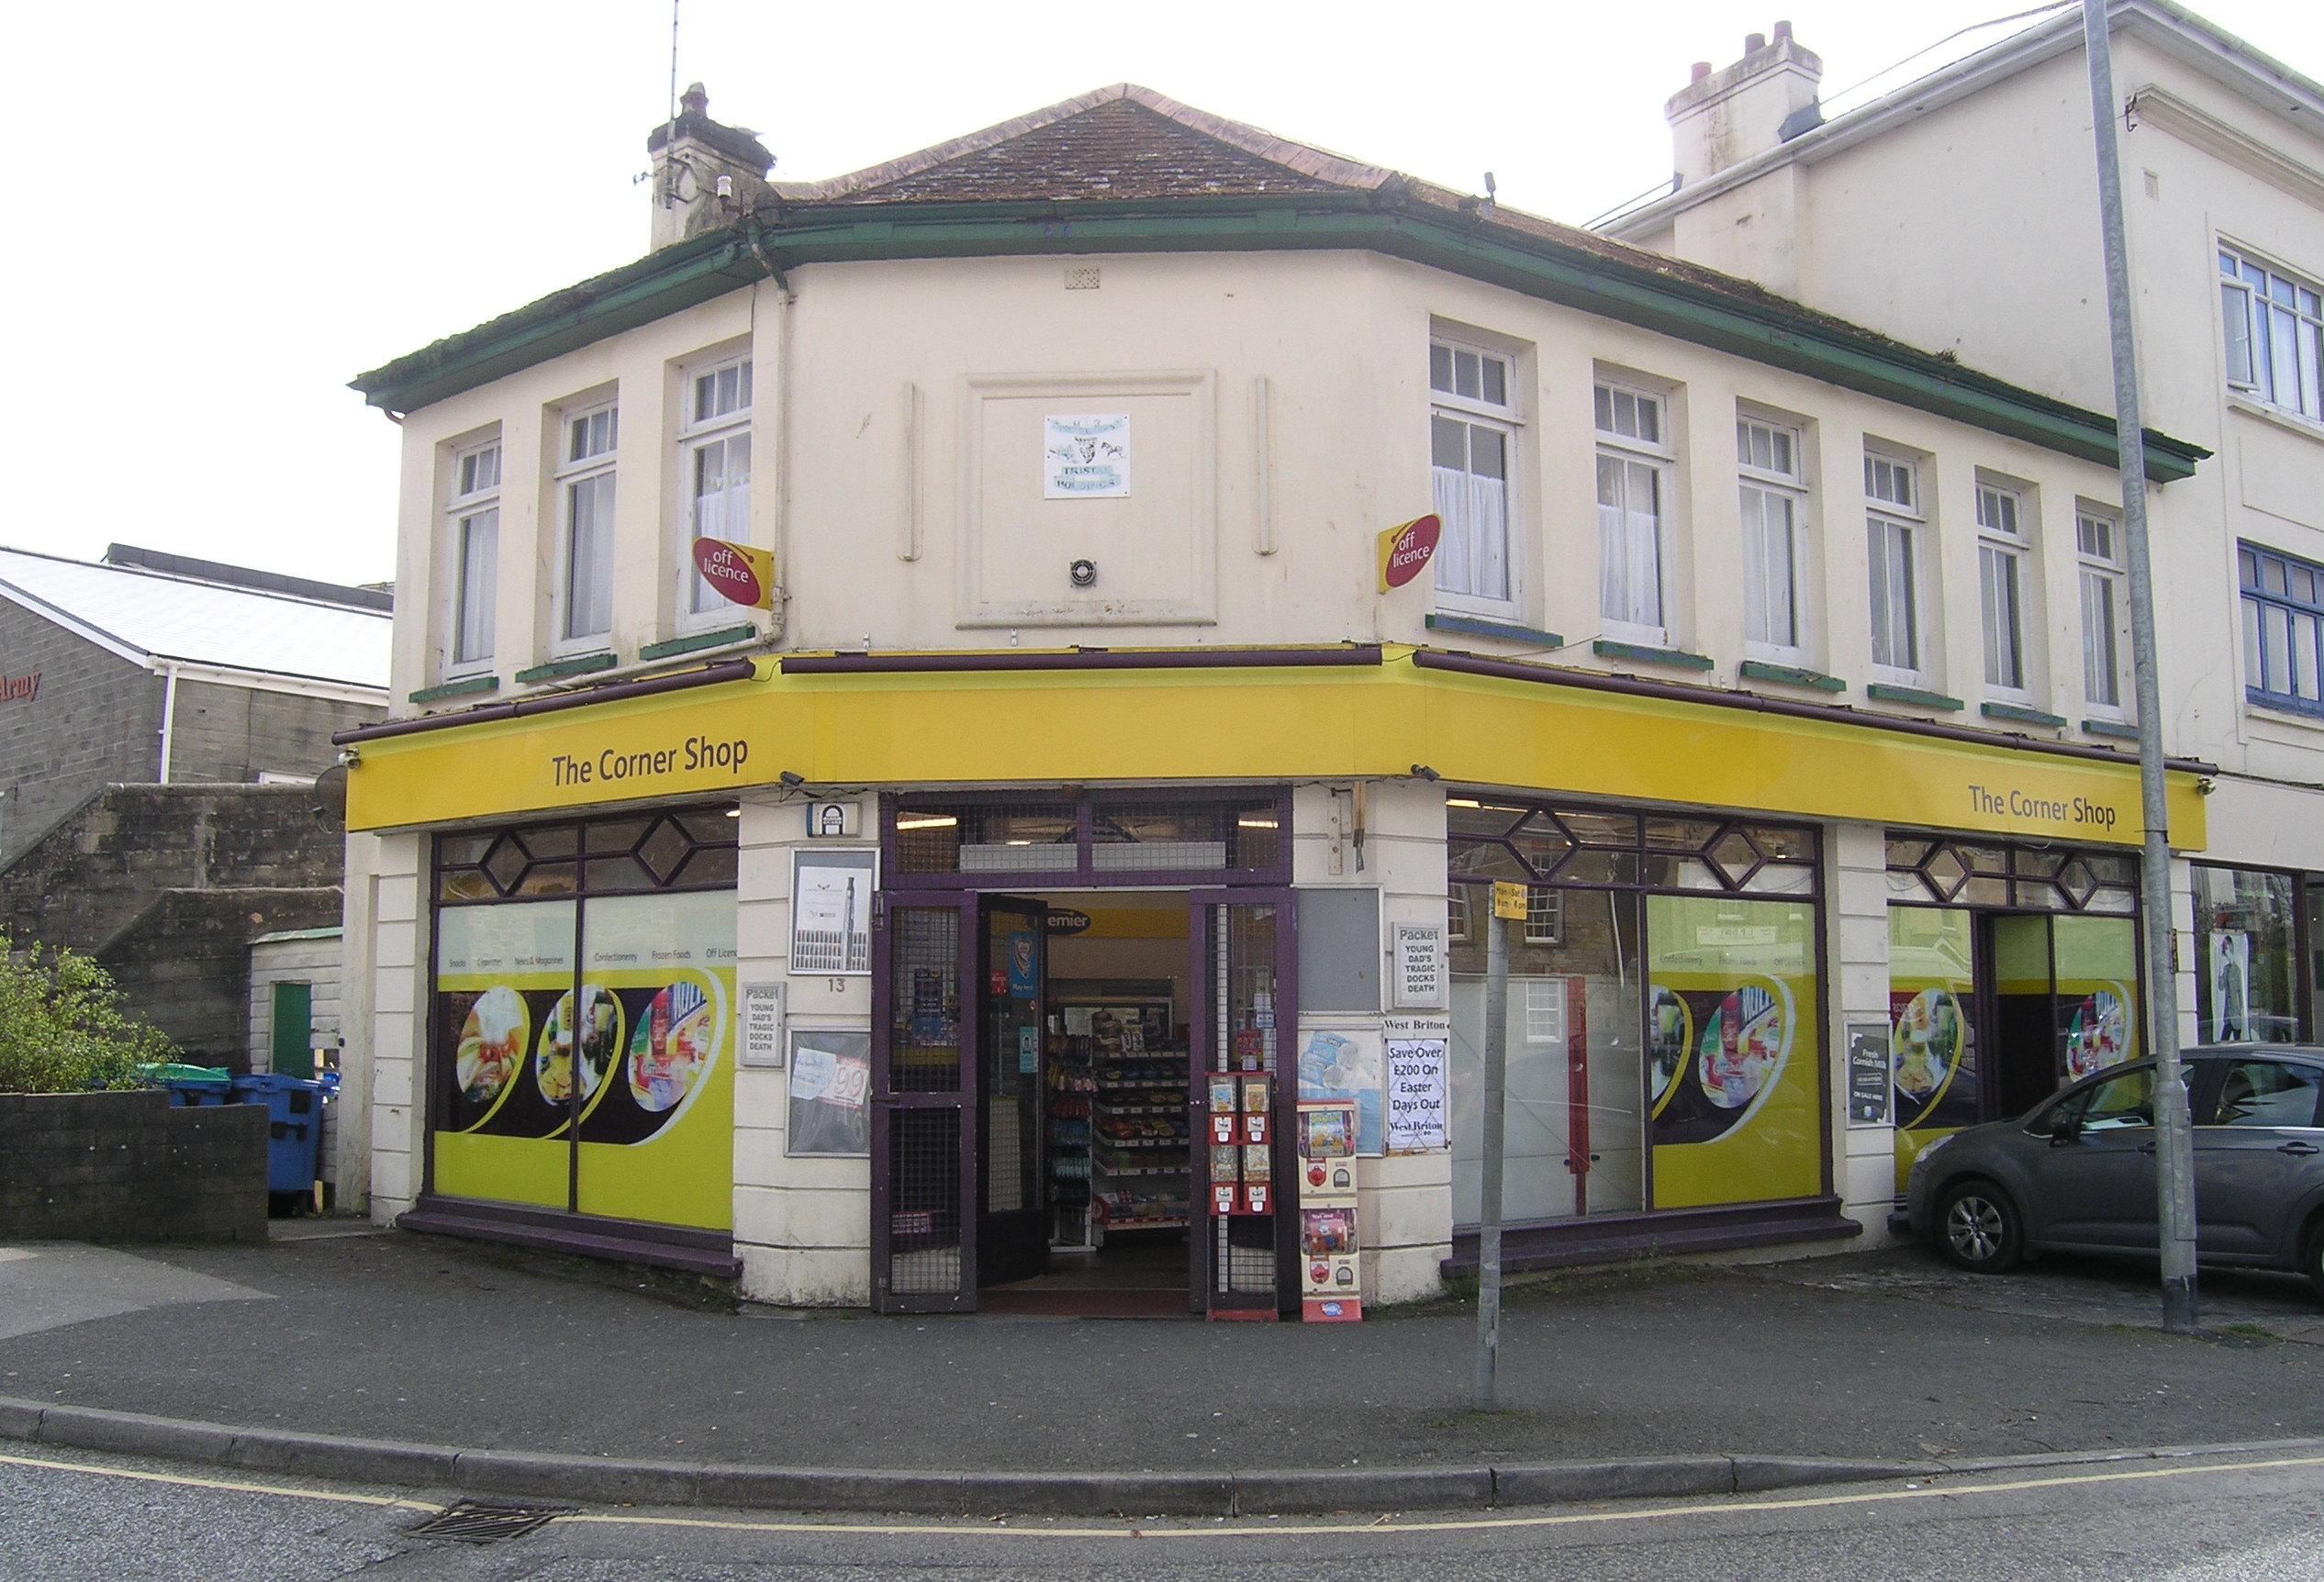 The Corner Shop, Falmouth